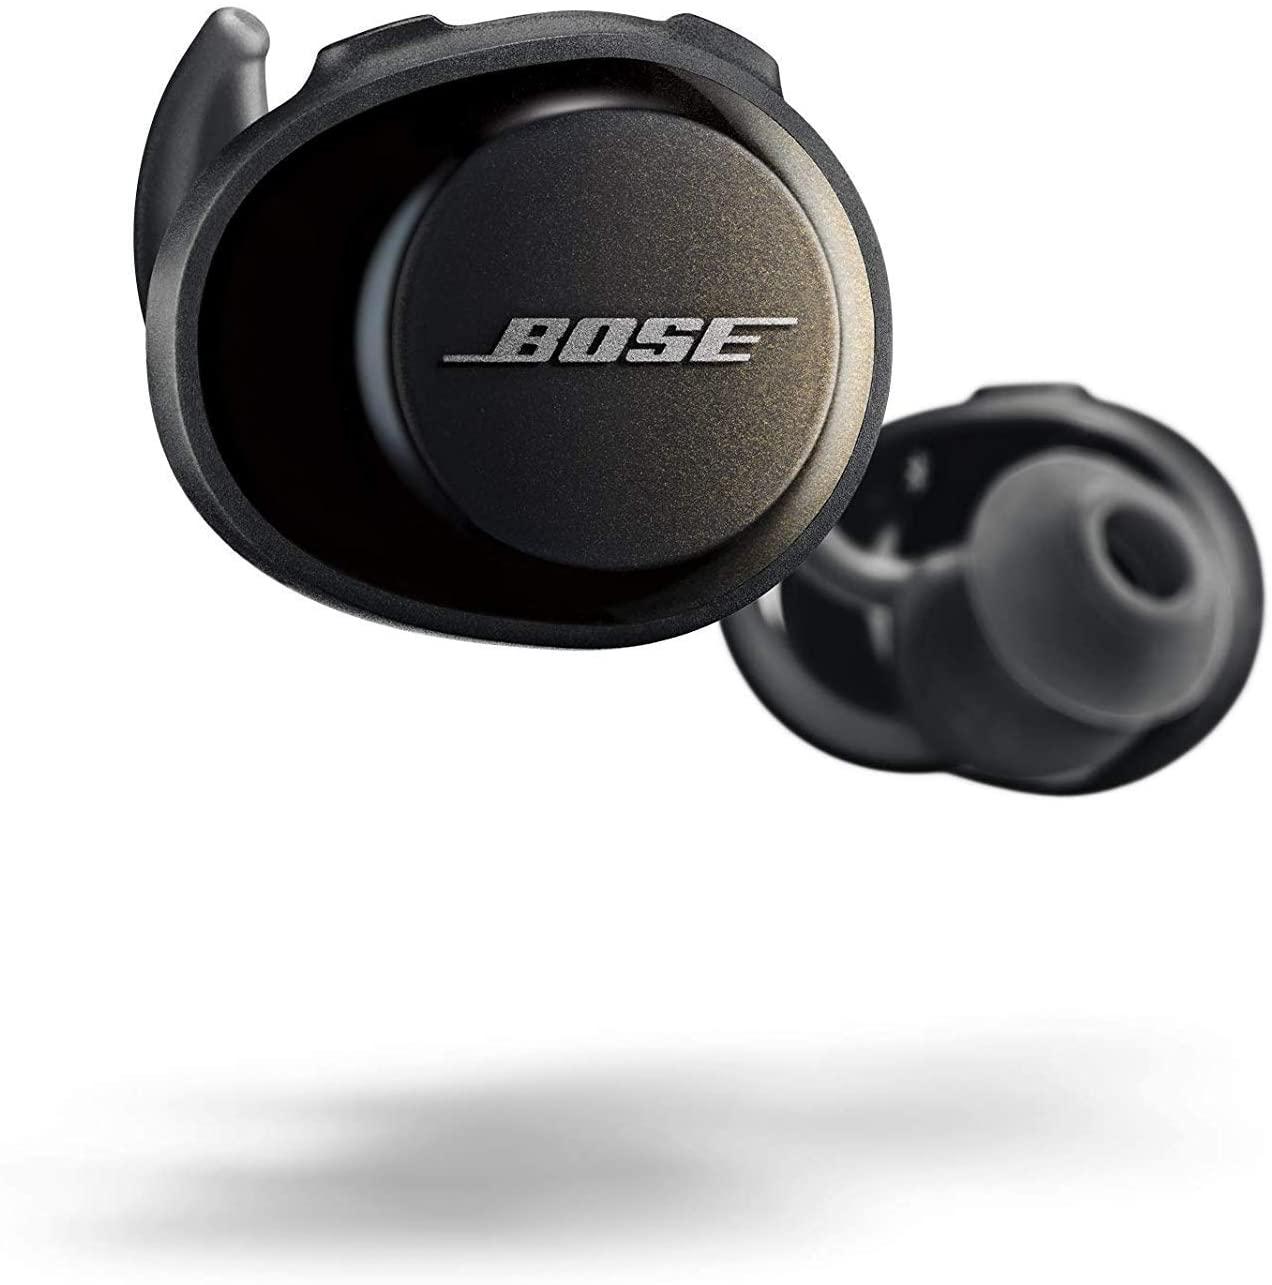 Imagem: Bose SoundSport Free